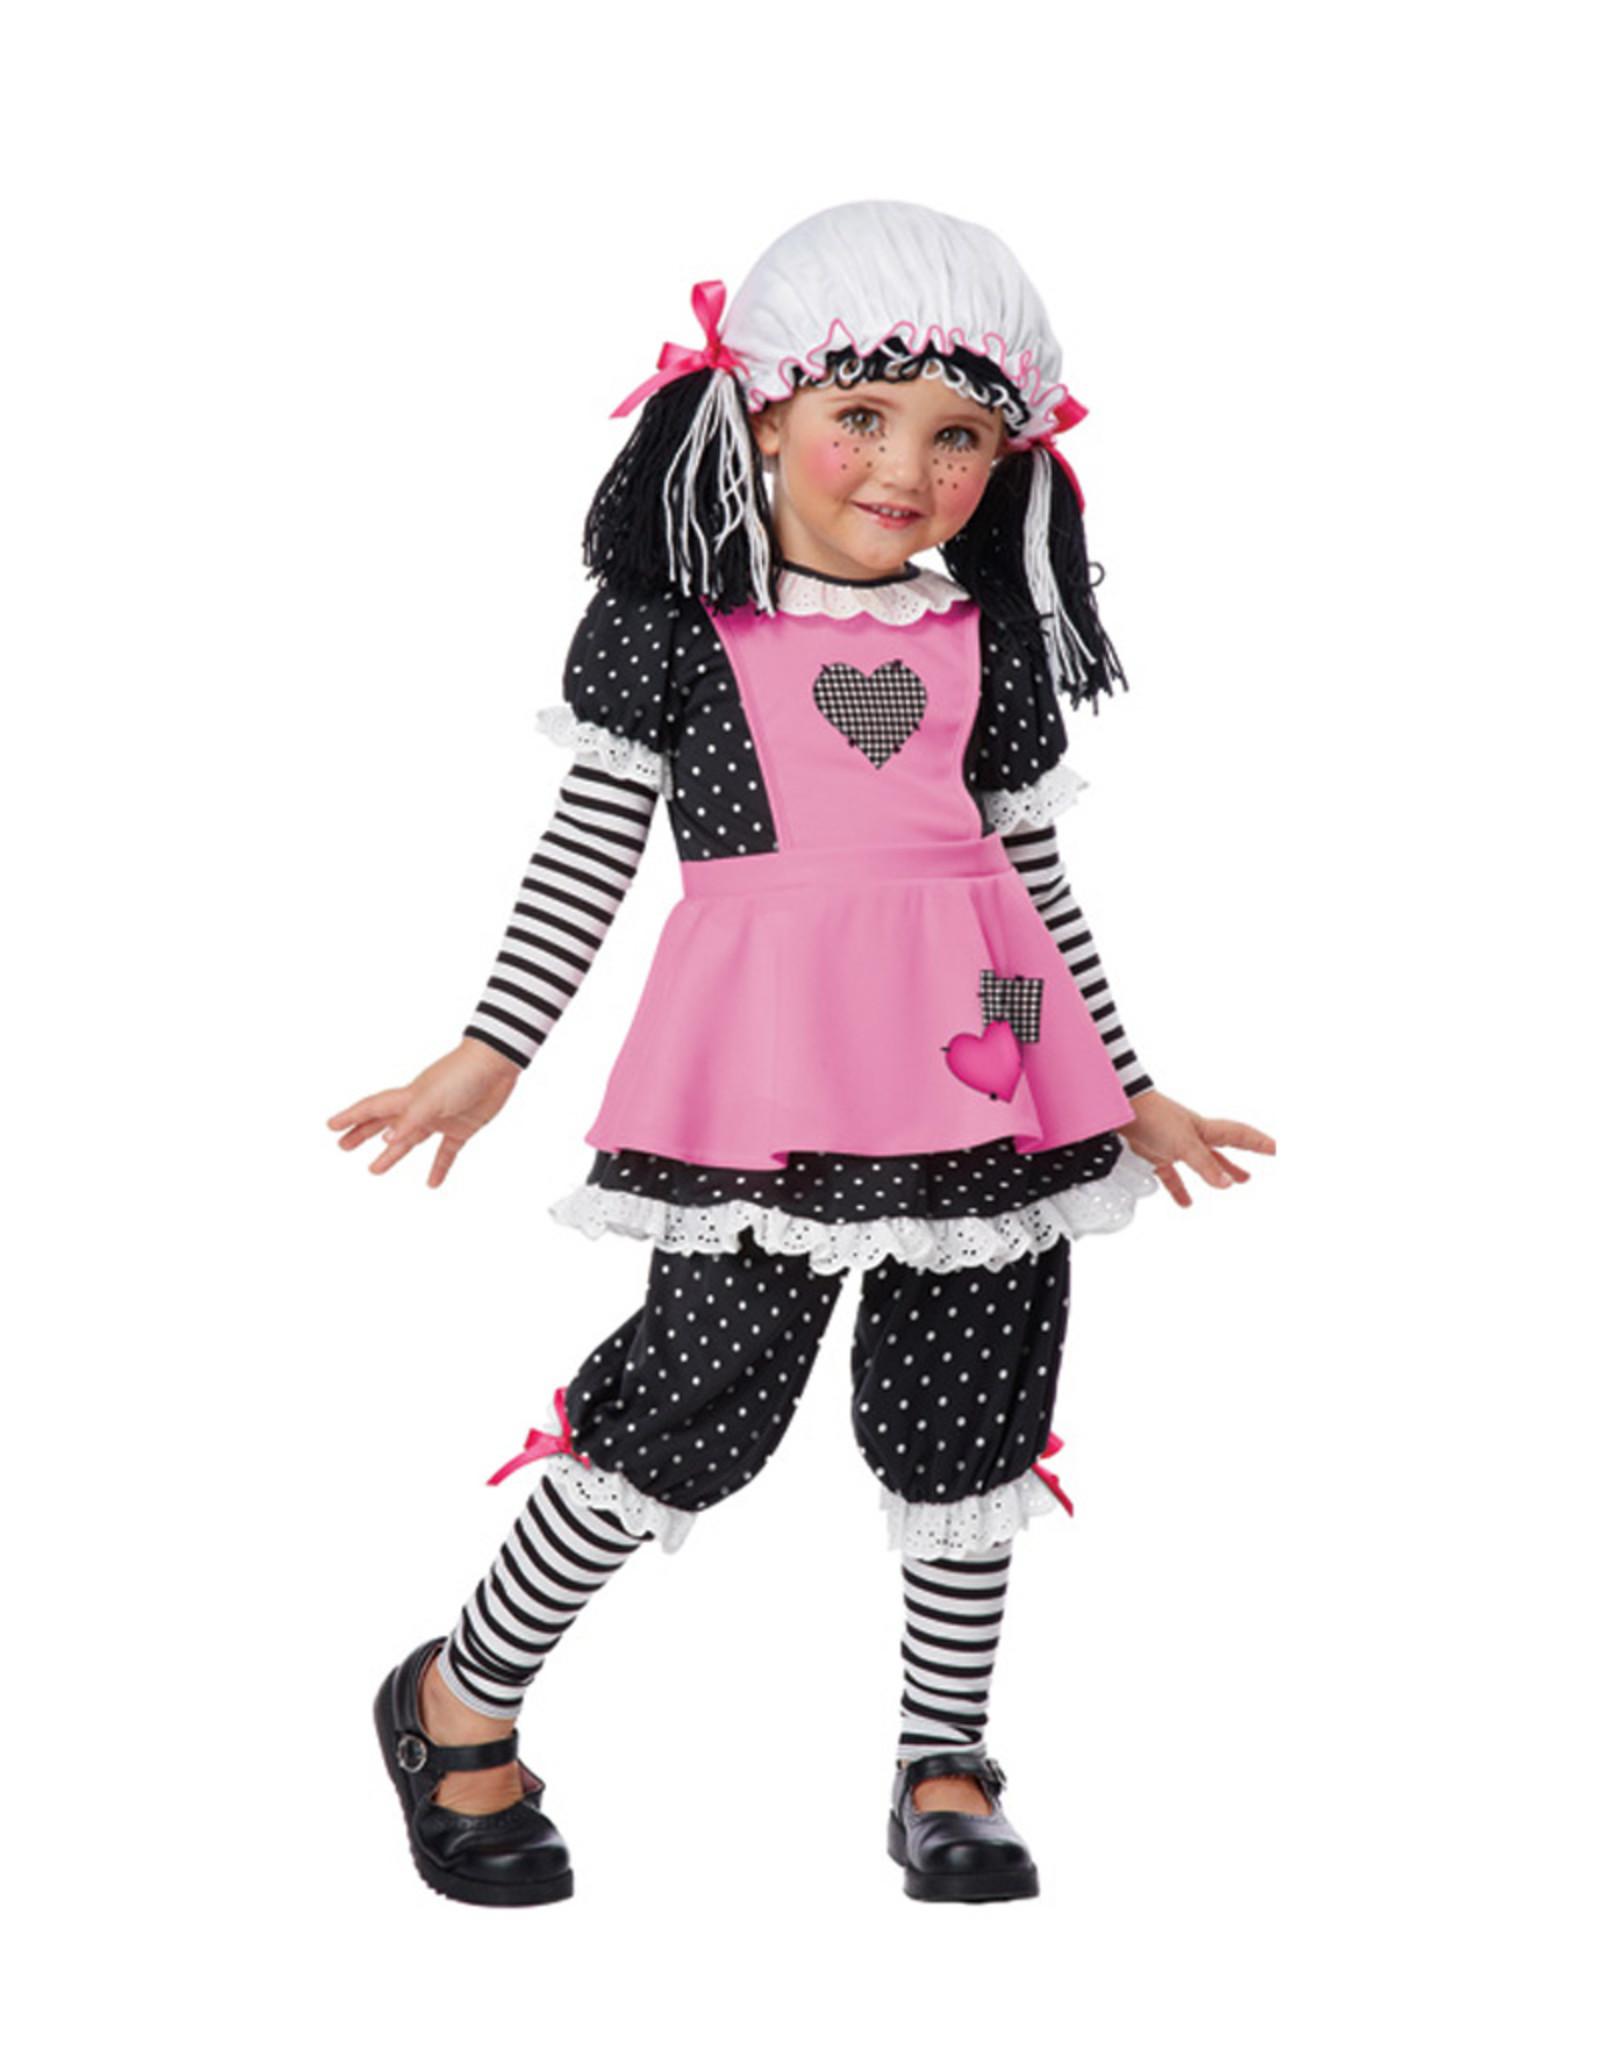 Rag Dolly Costume - Toddler